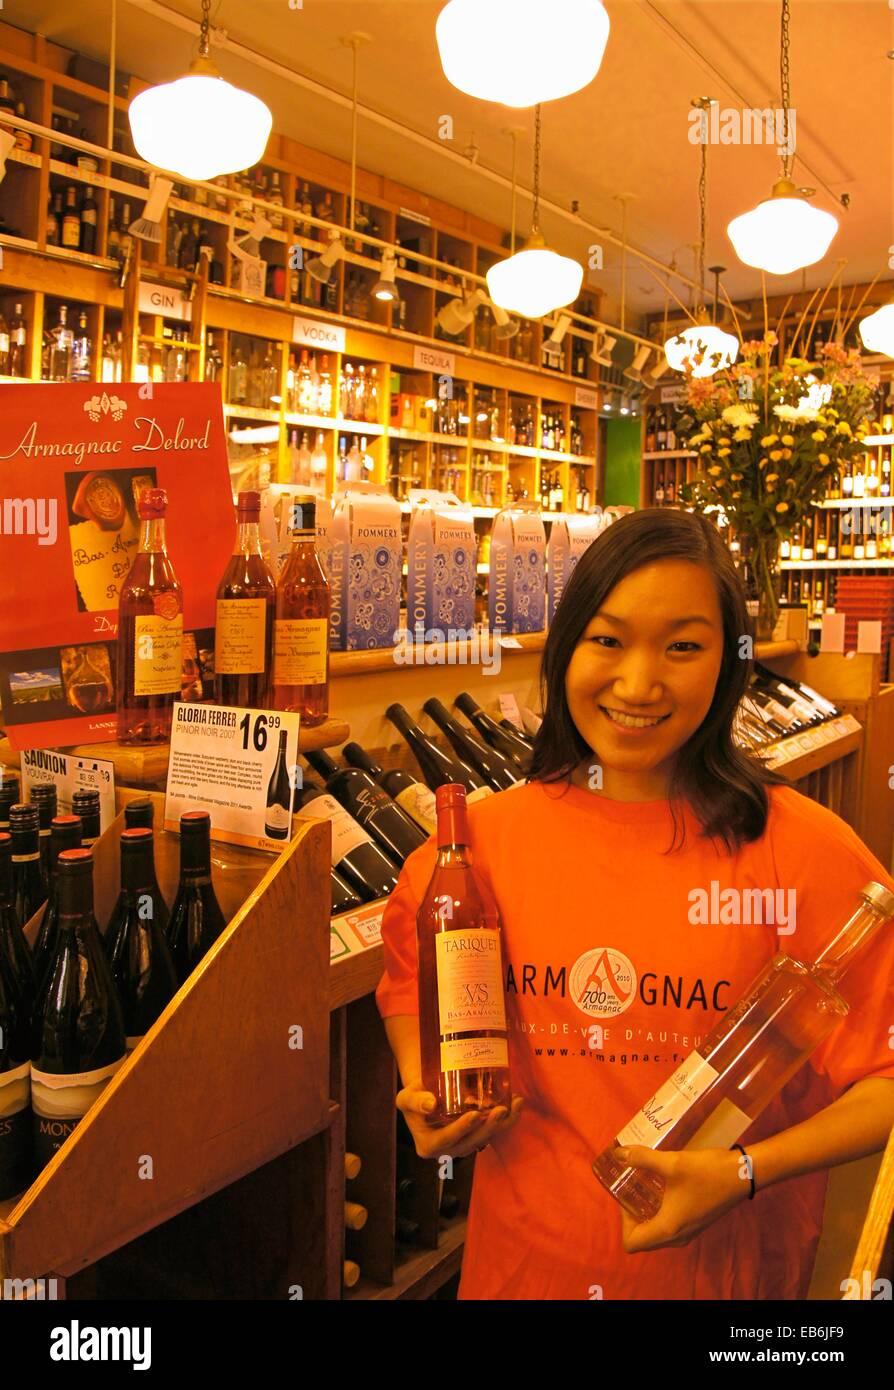 USA, New York, Samantha Weinberg presenting Armagnac at ´67 Wine´ Stock Photo